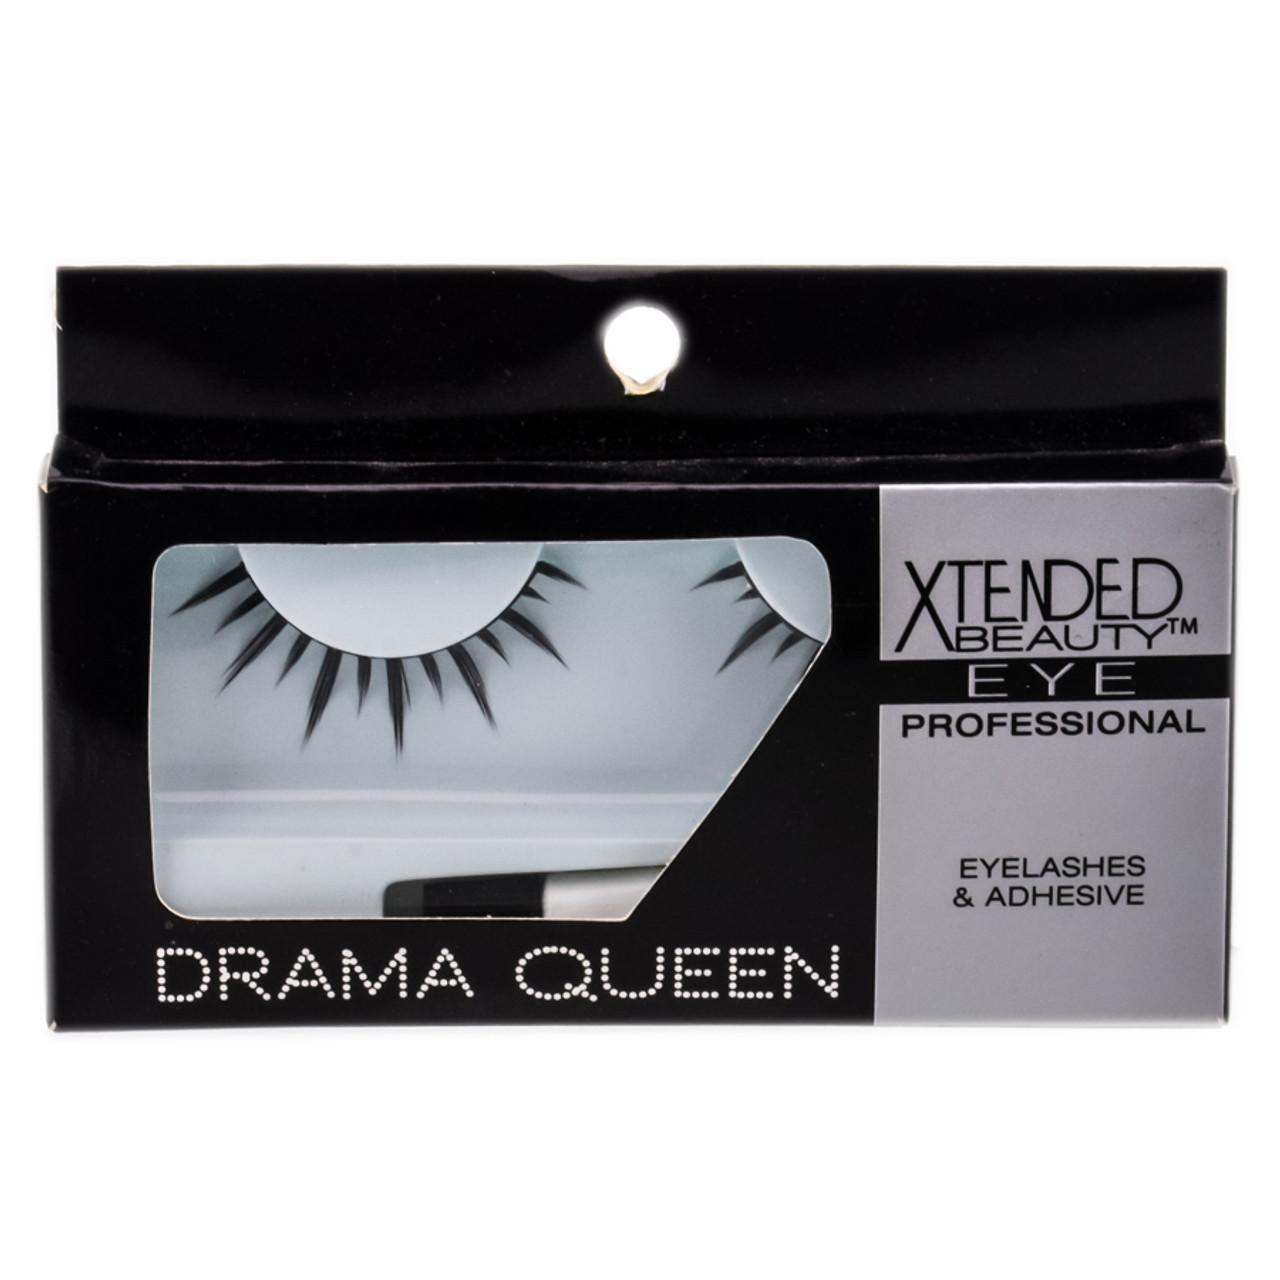 Reese Robert Xtended Beauty Eye Professional Eyelashes